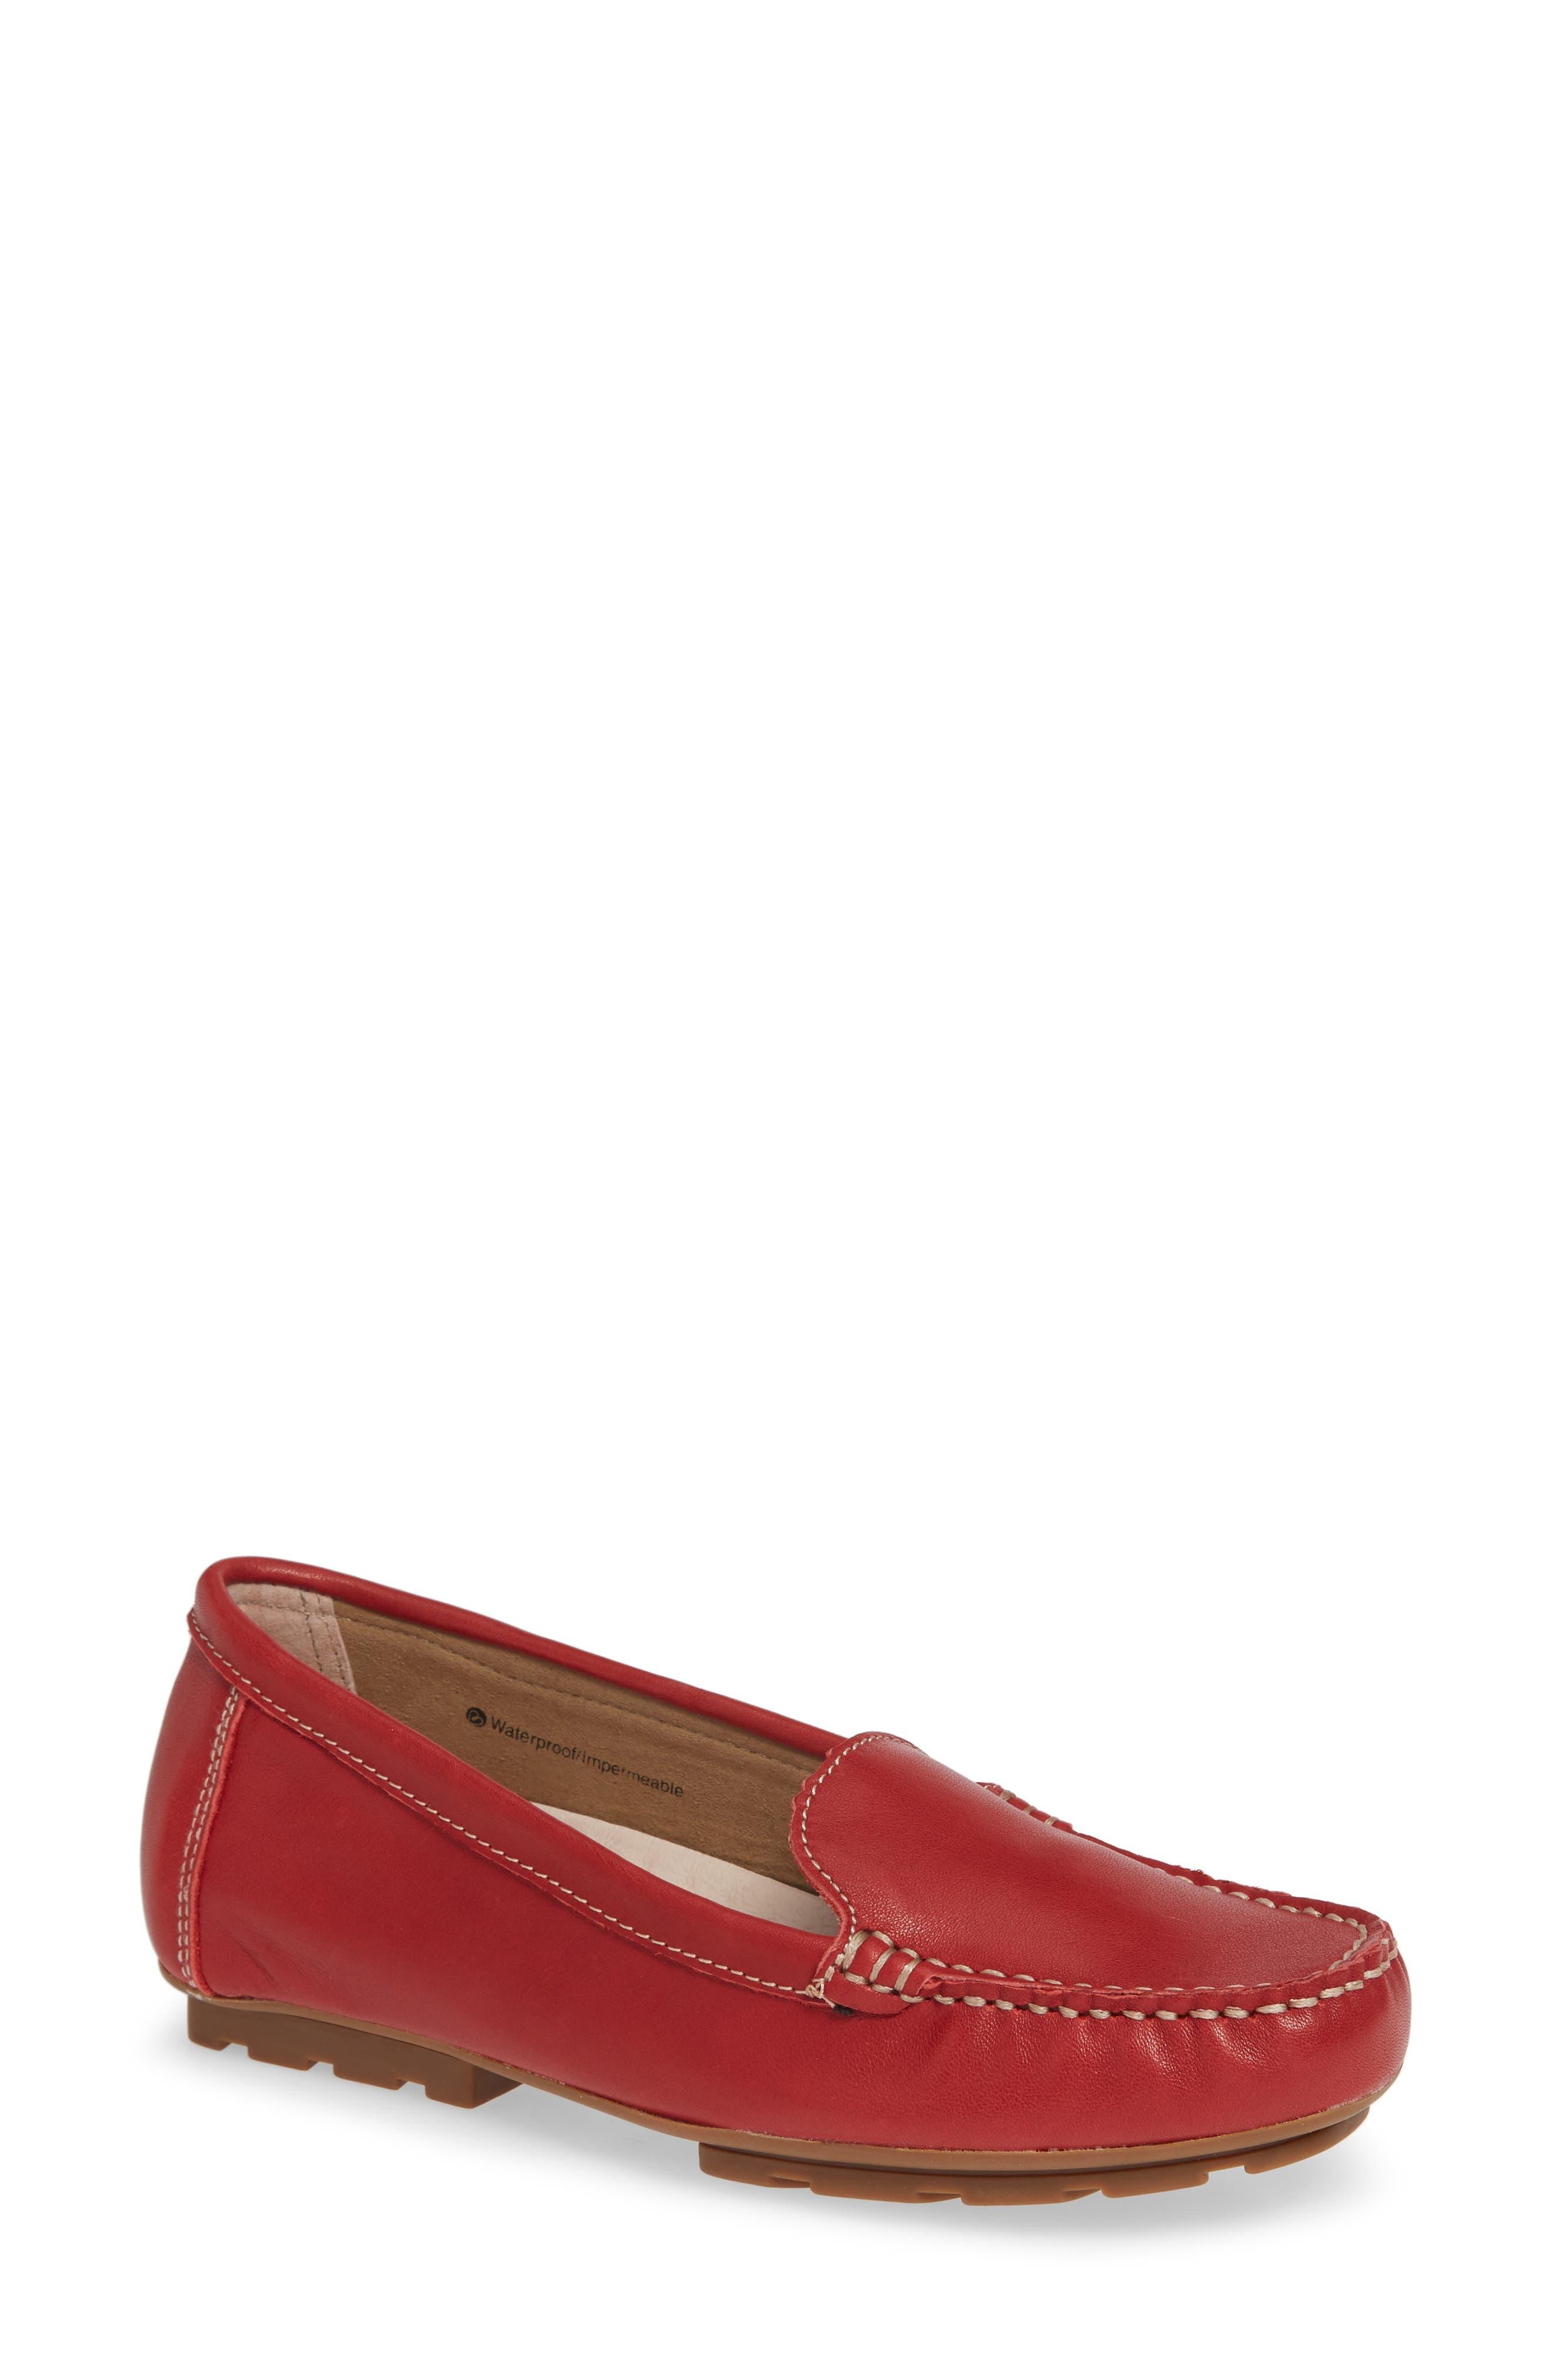 Blondo Dale Waterproof Flat- Red